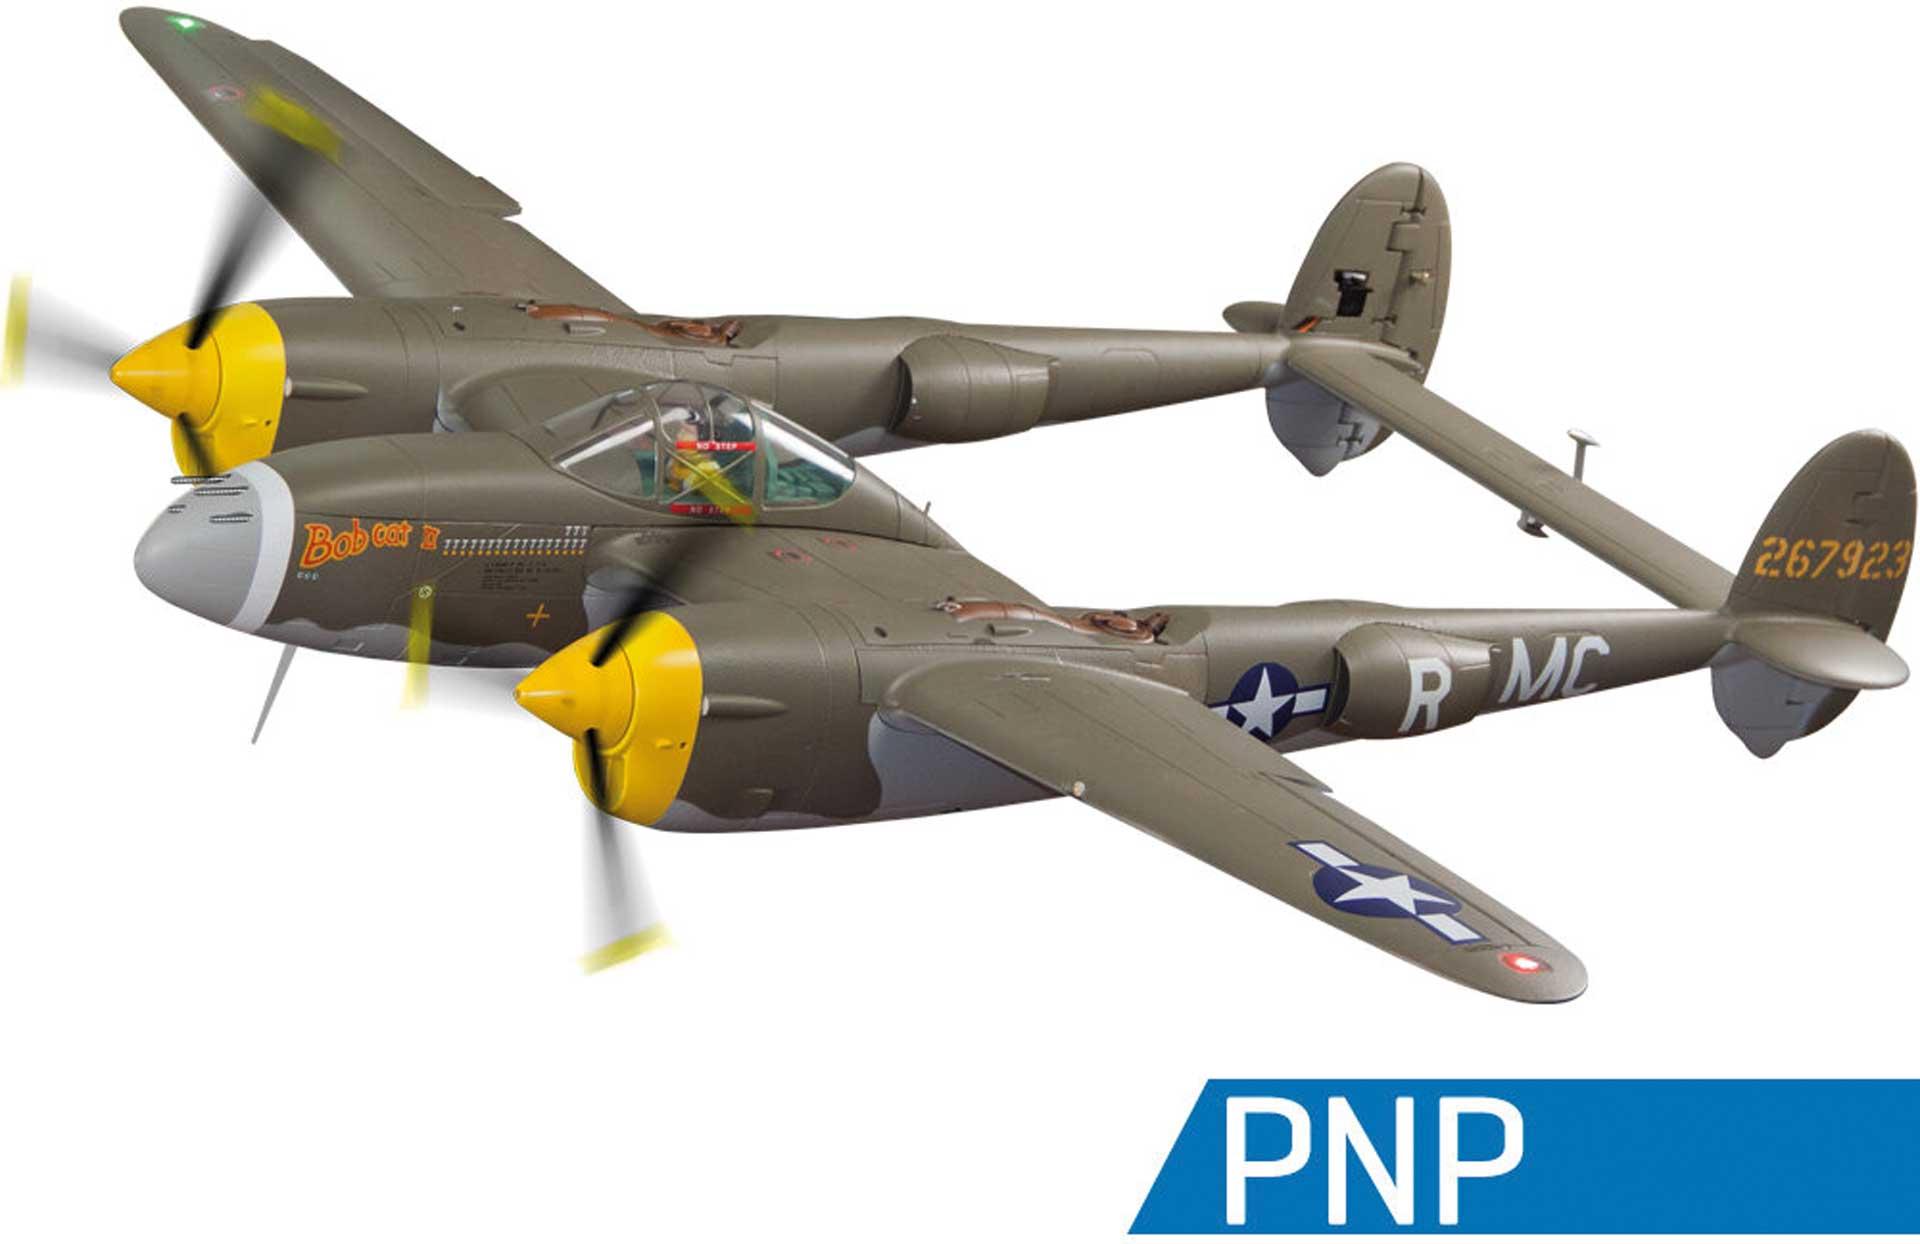 FREEWING P-38L Lightning 1600mm grün PNP FlightLineRC Warbird